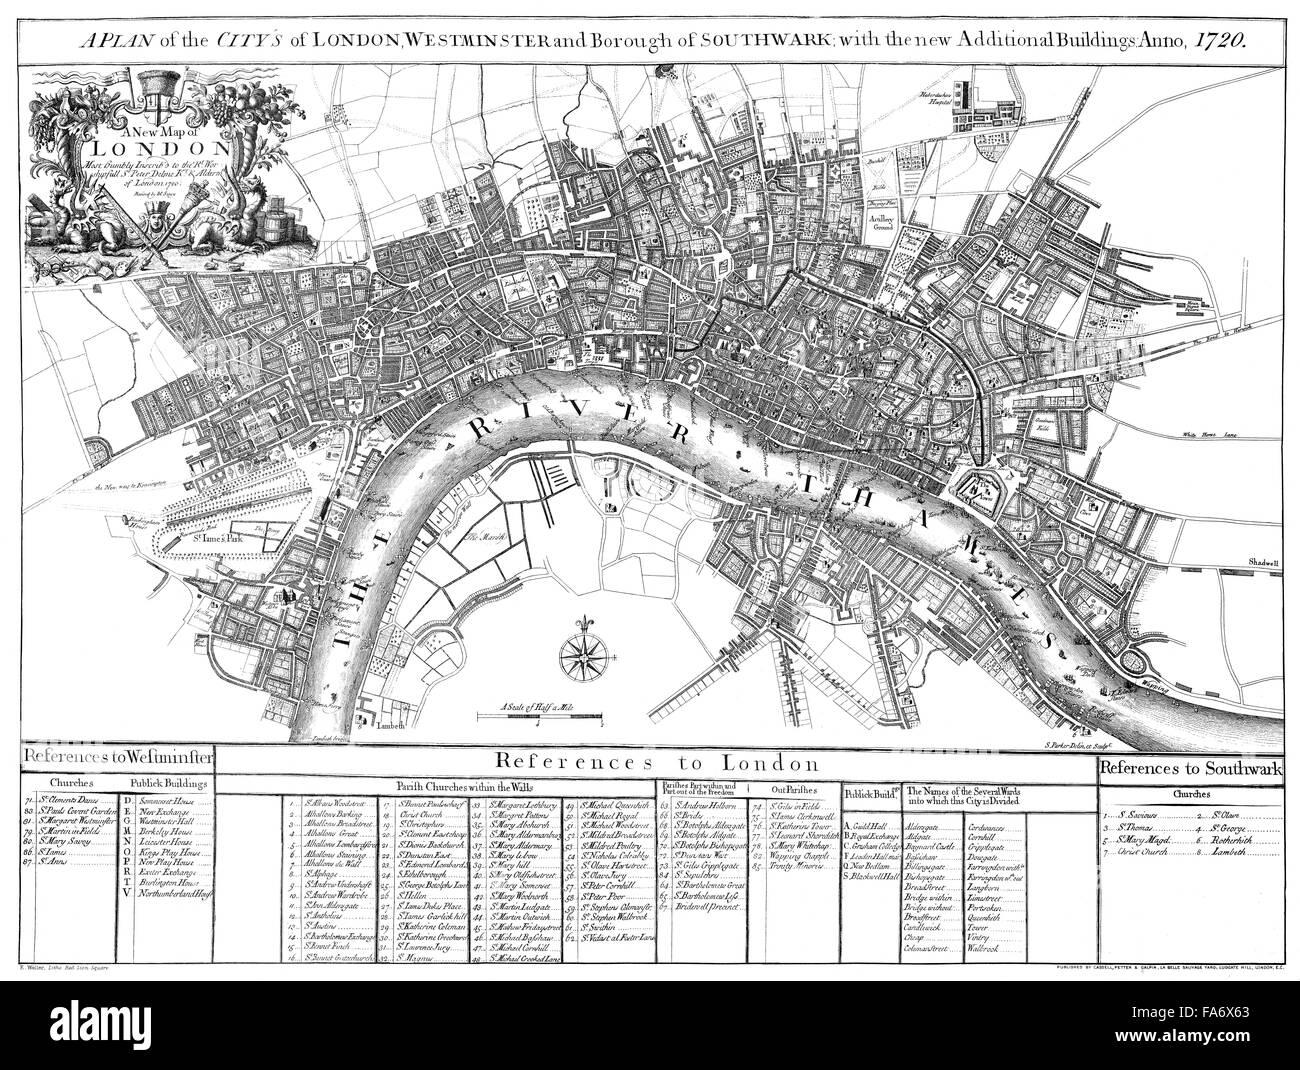 City Map Of London England 1720 Stadtplan Von London 1720 Stock